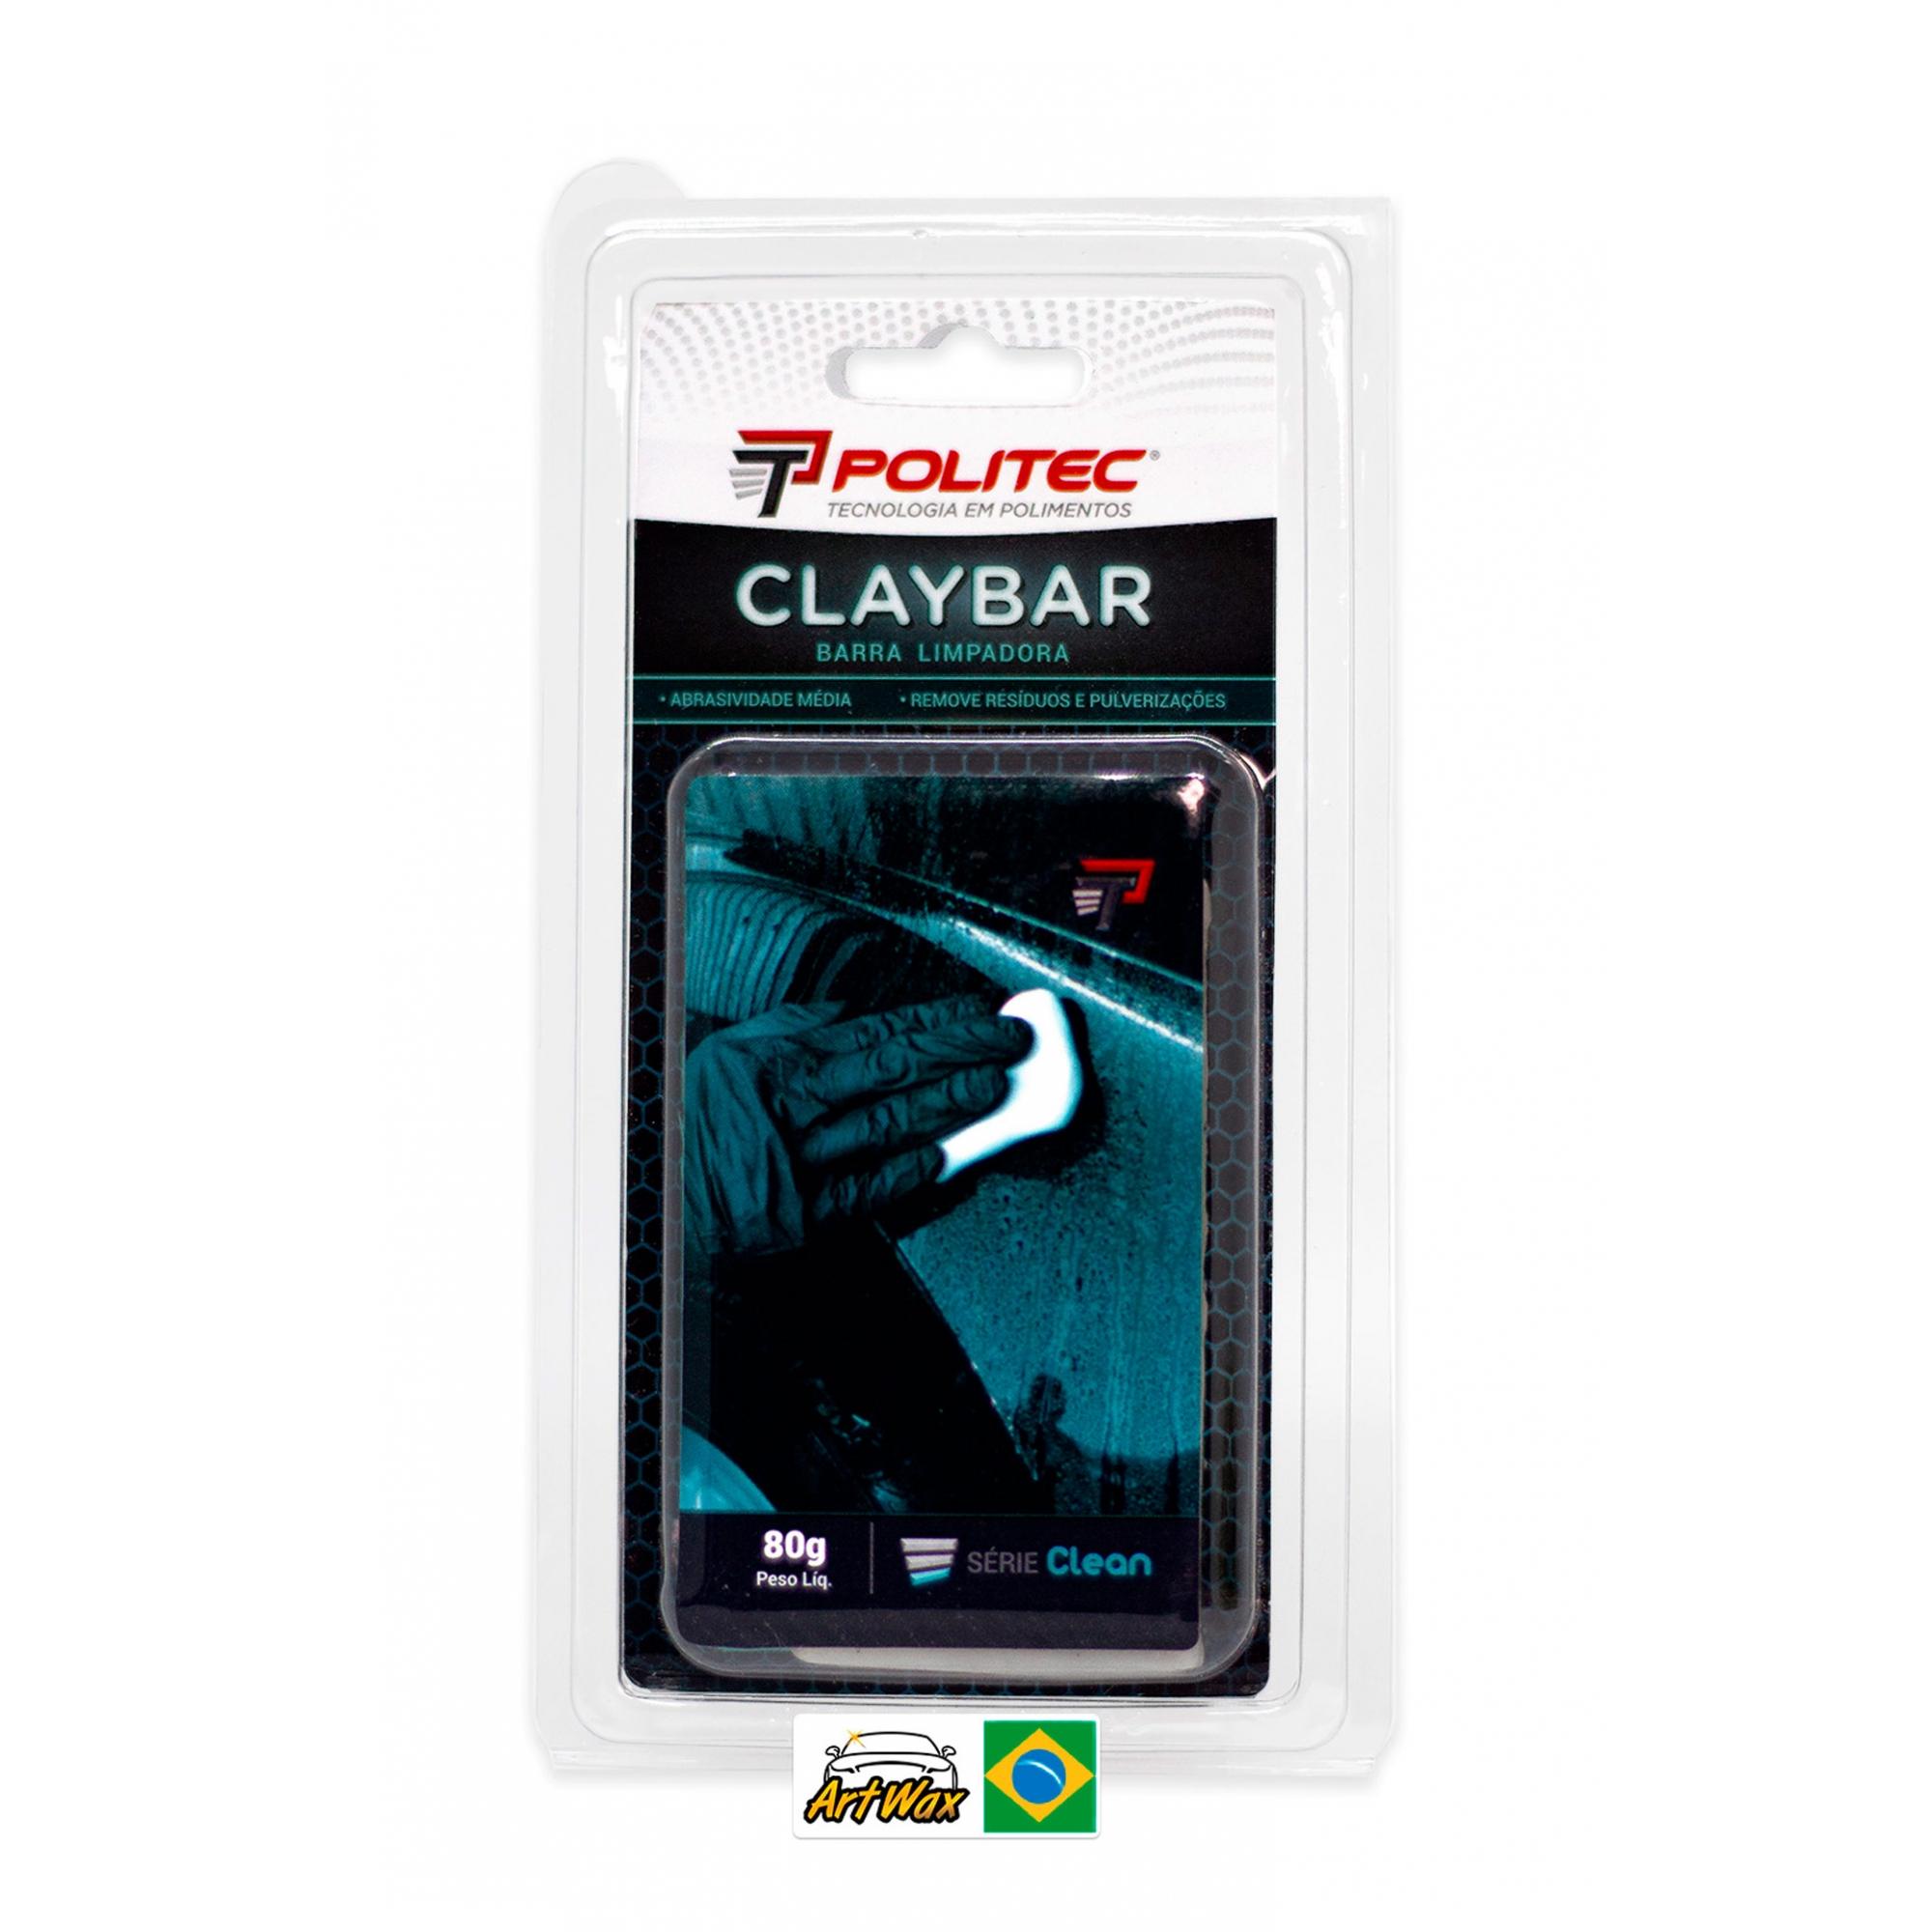 Claybar 80gr - Barra Descontaminante de Pintura Politec